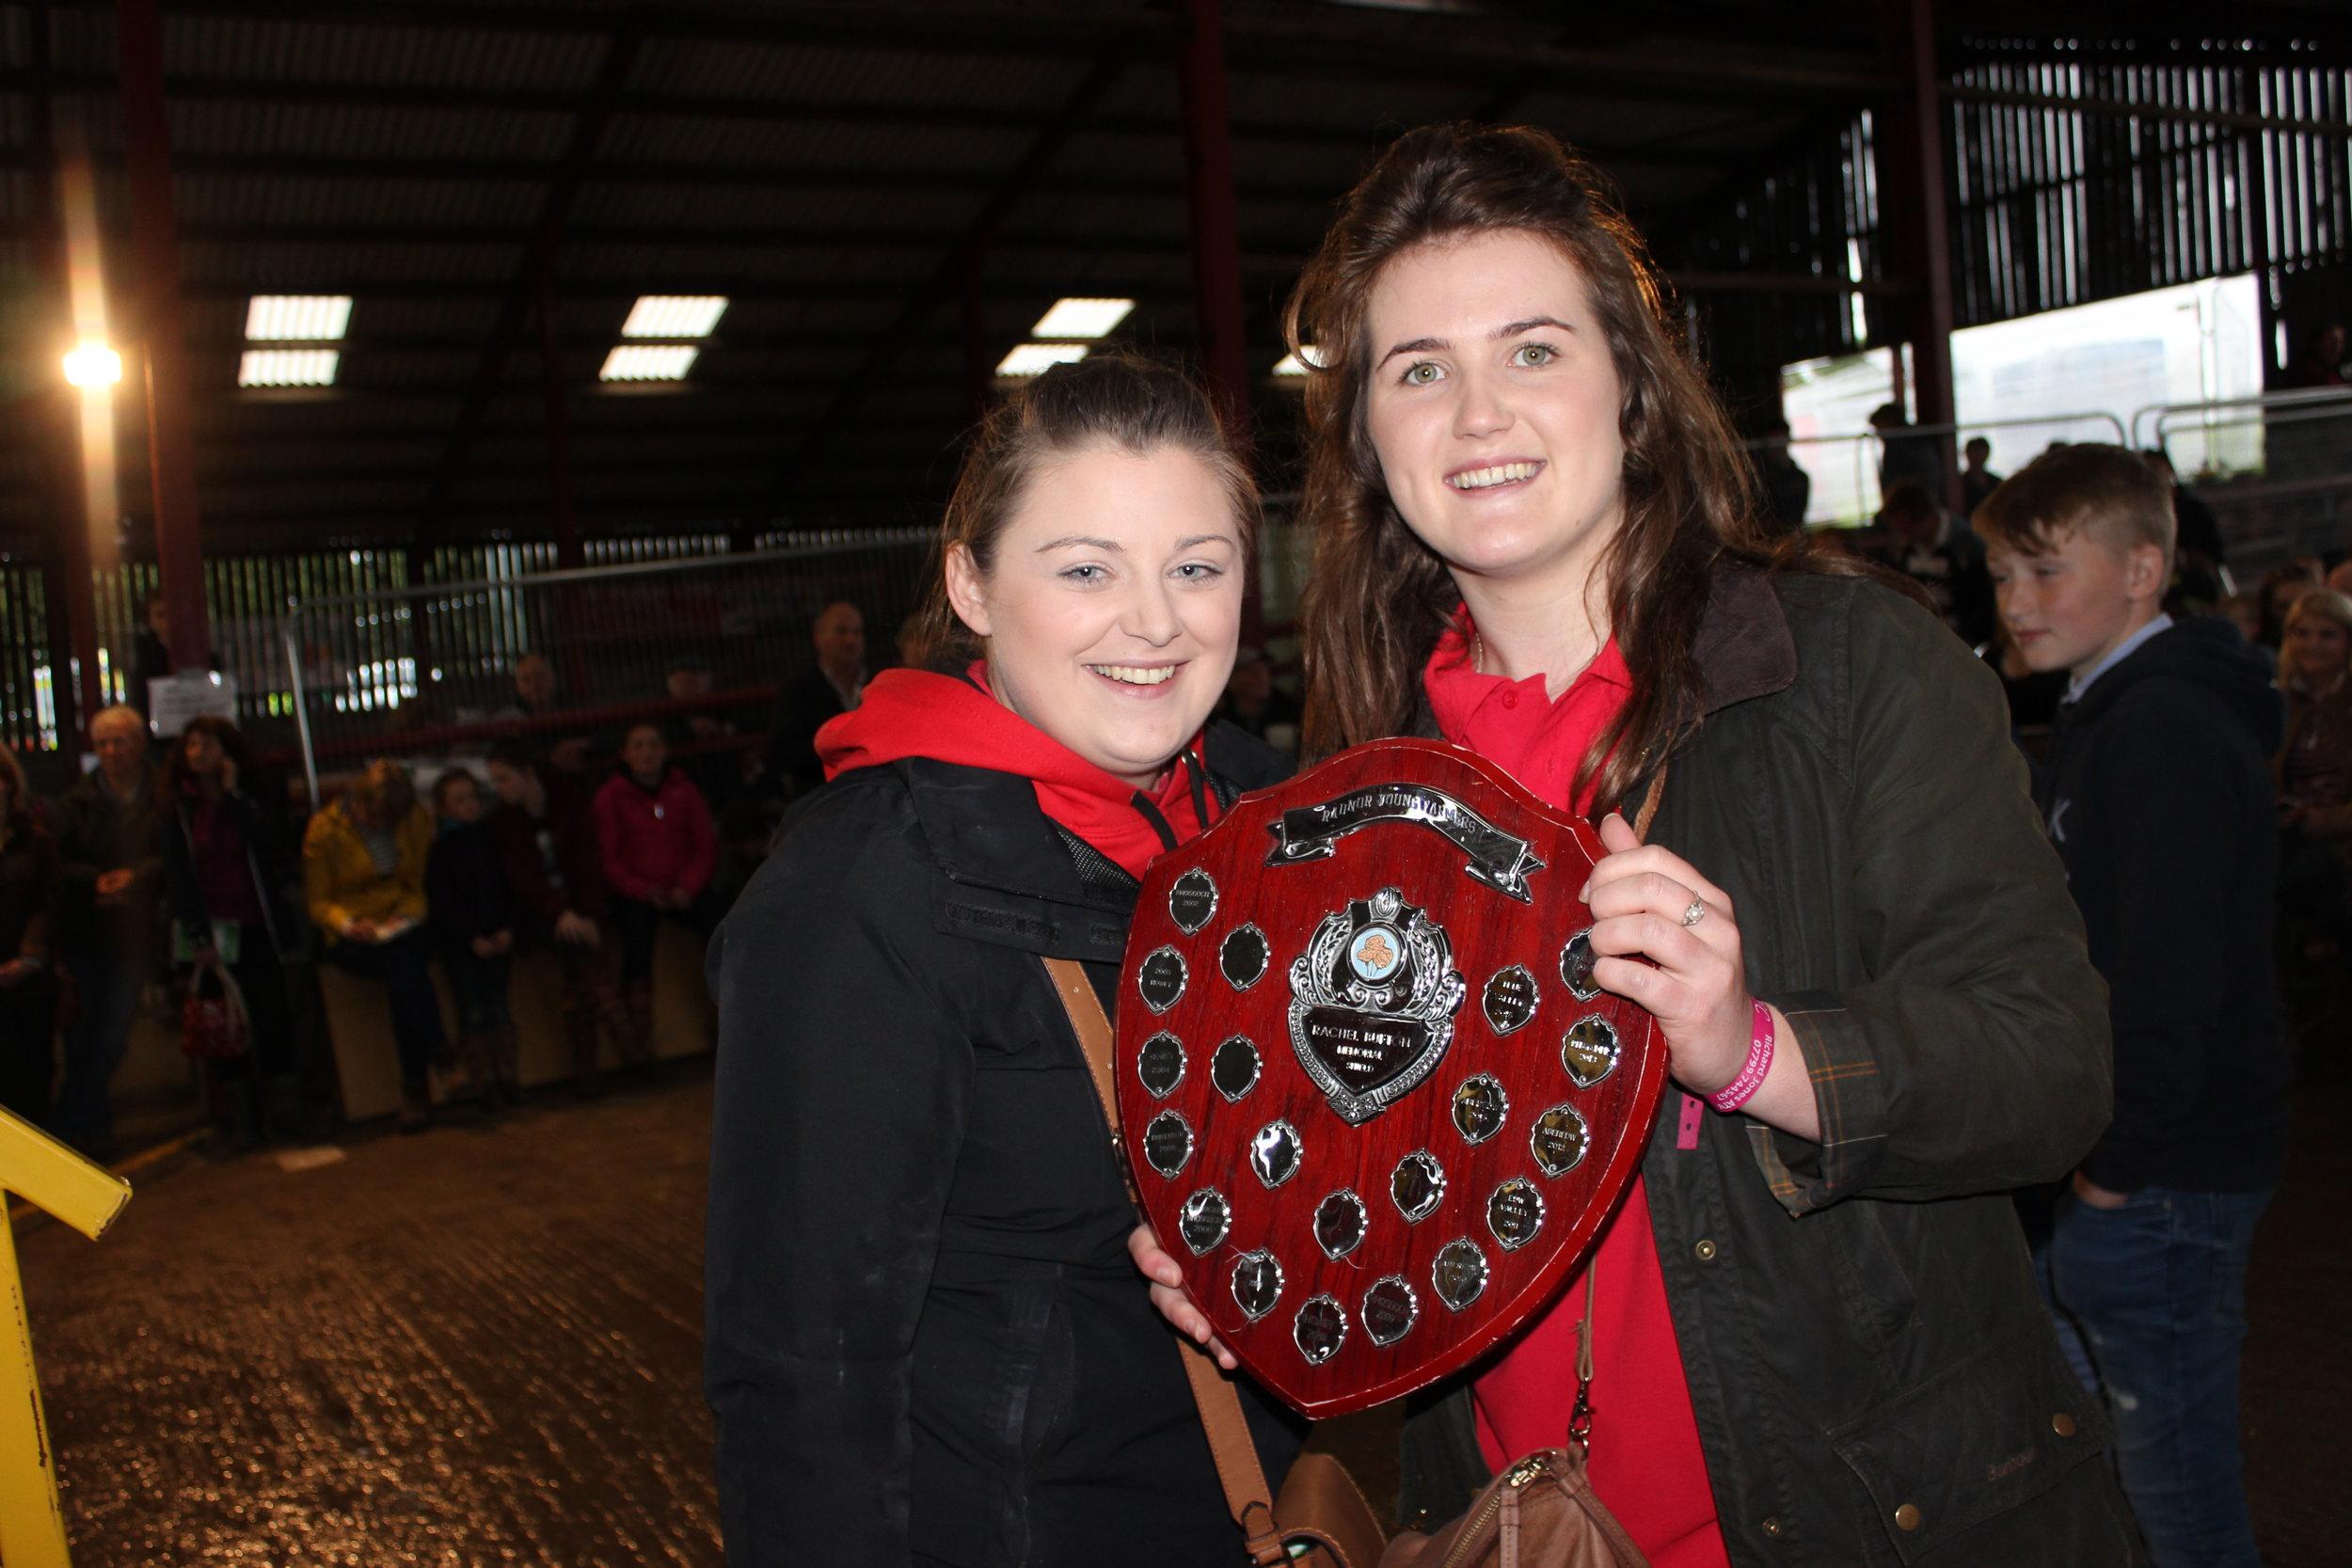 Jess Barrett & Ella Harris, Teme Valley YFC - Rachel Bufton Memorial Shield (Floral Competitions)